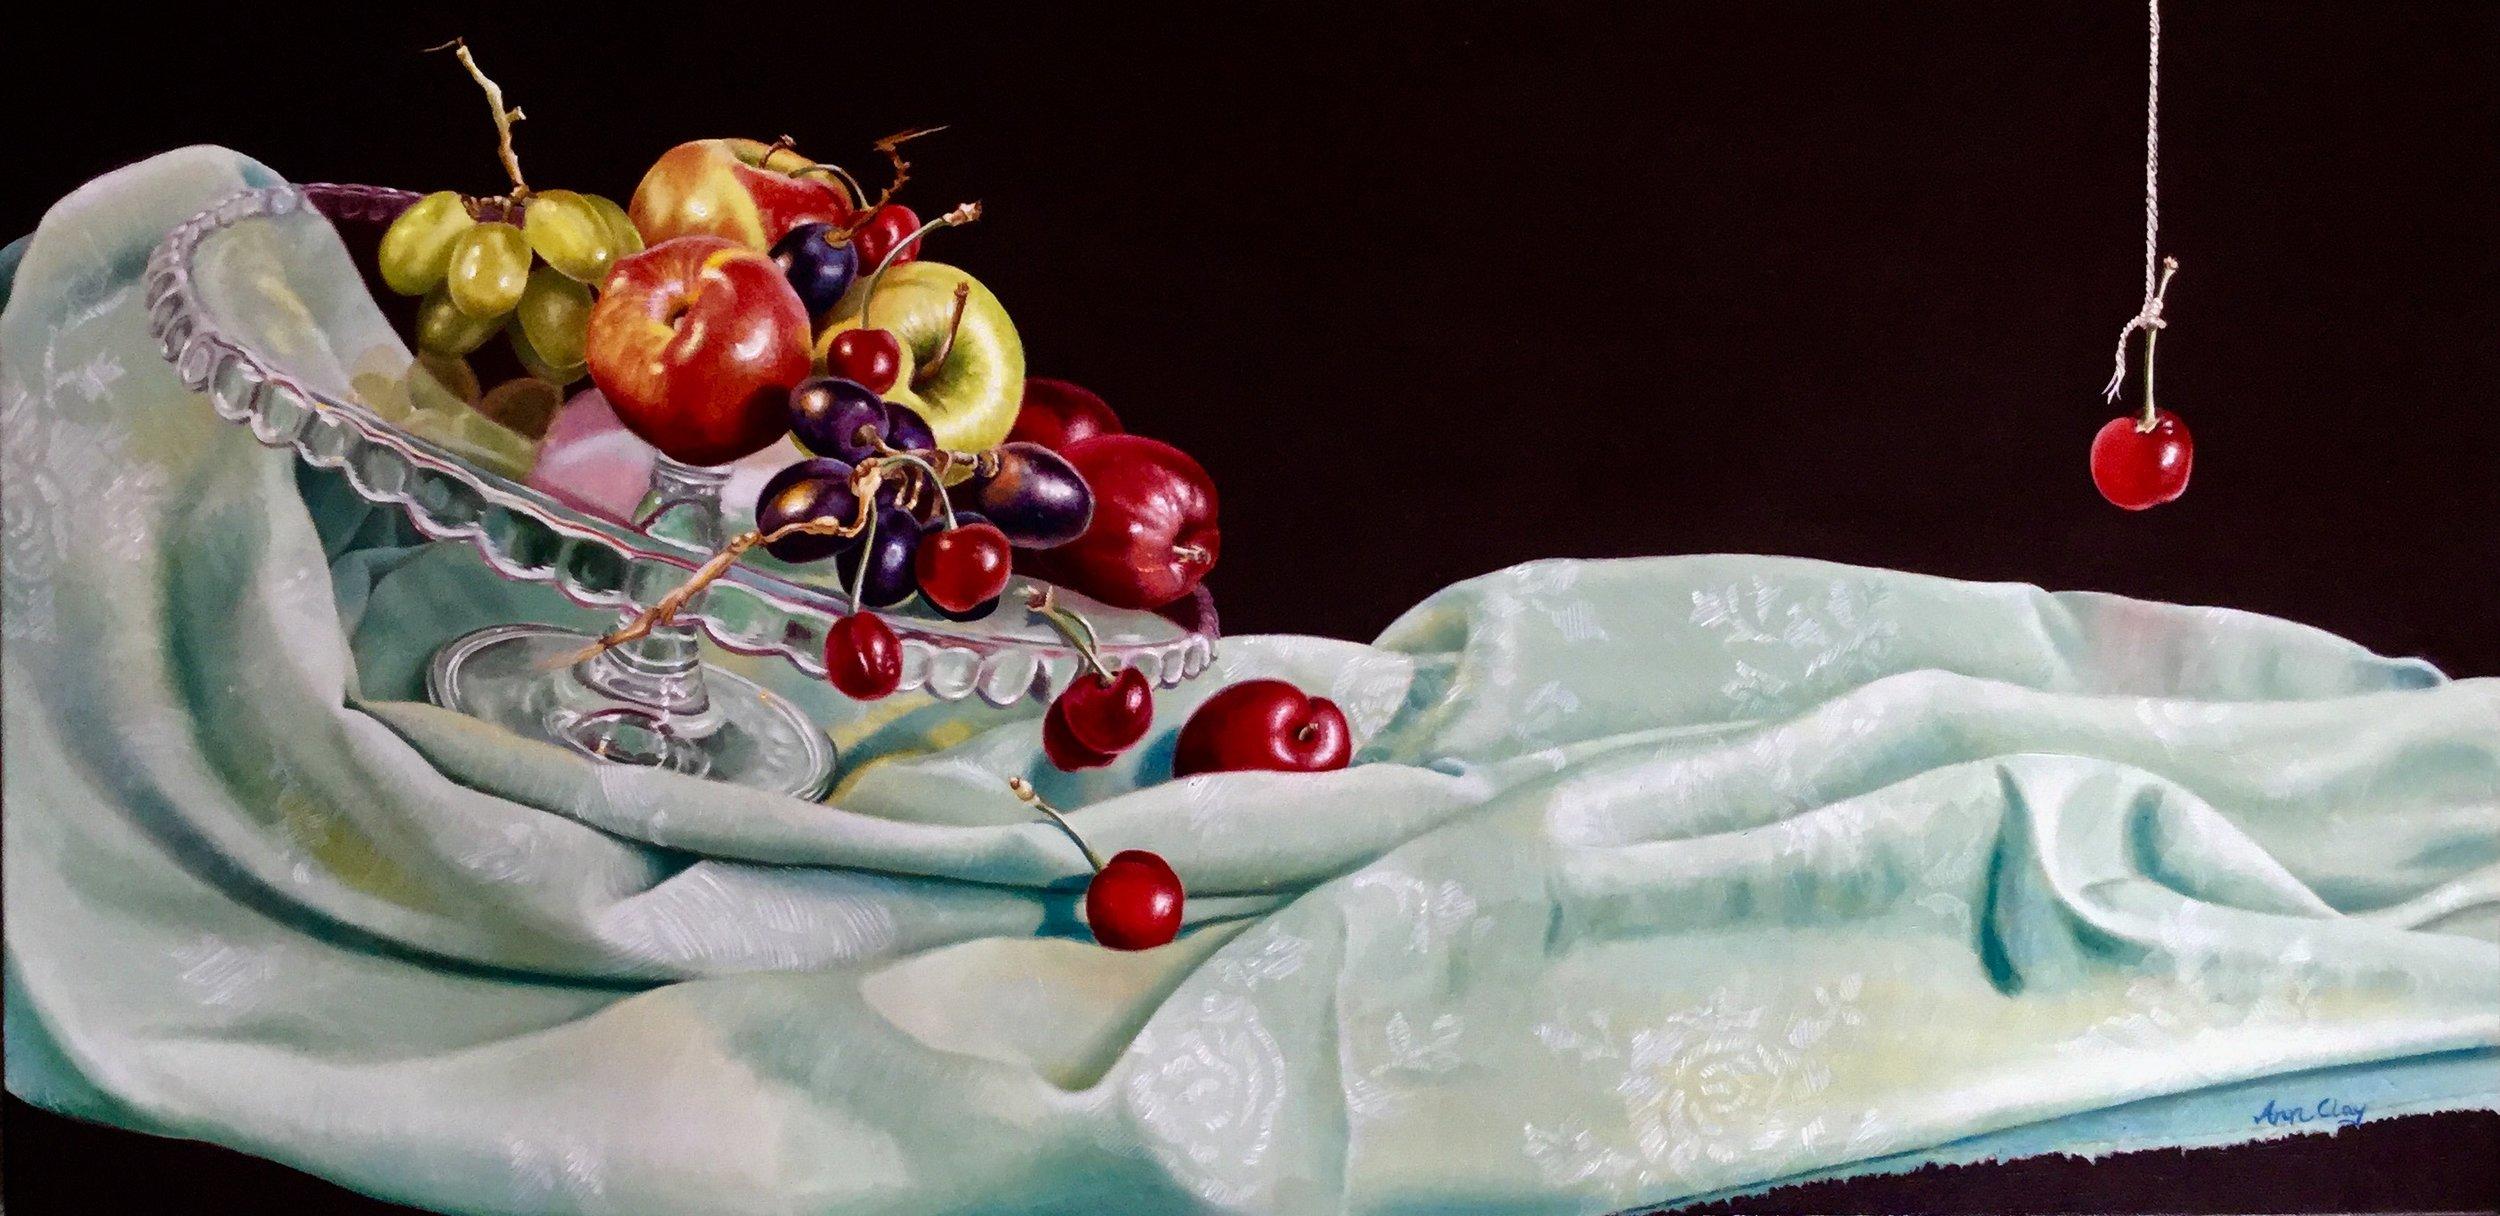 Ann Clay, Ann Clay, Slide, Oil paint on canvas, 40cm x 80cm x 1.5cm,  http://www.annclayart.weebly.com